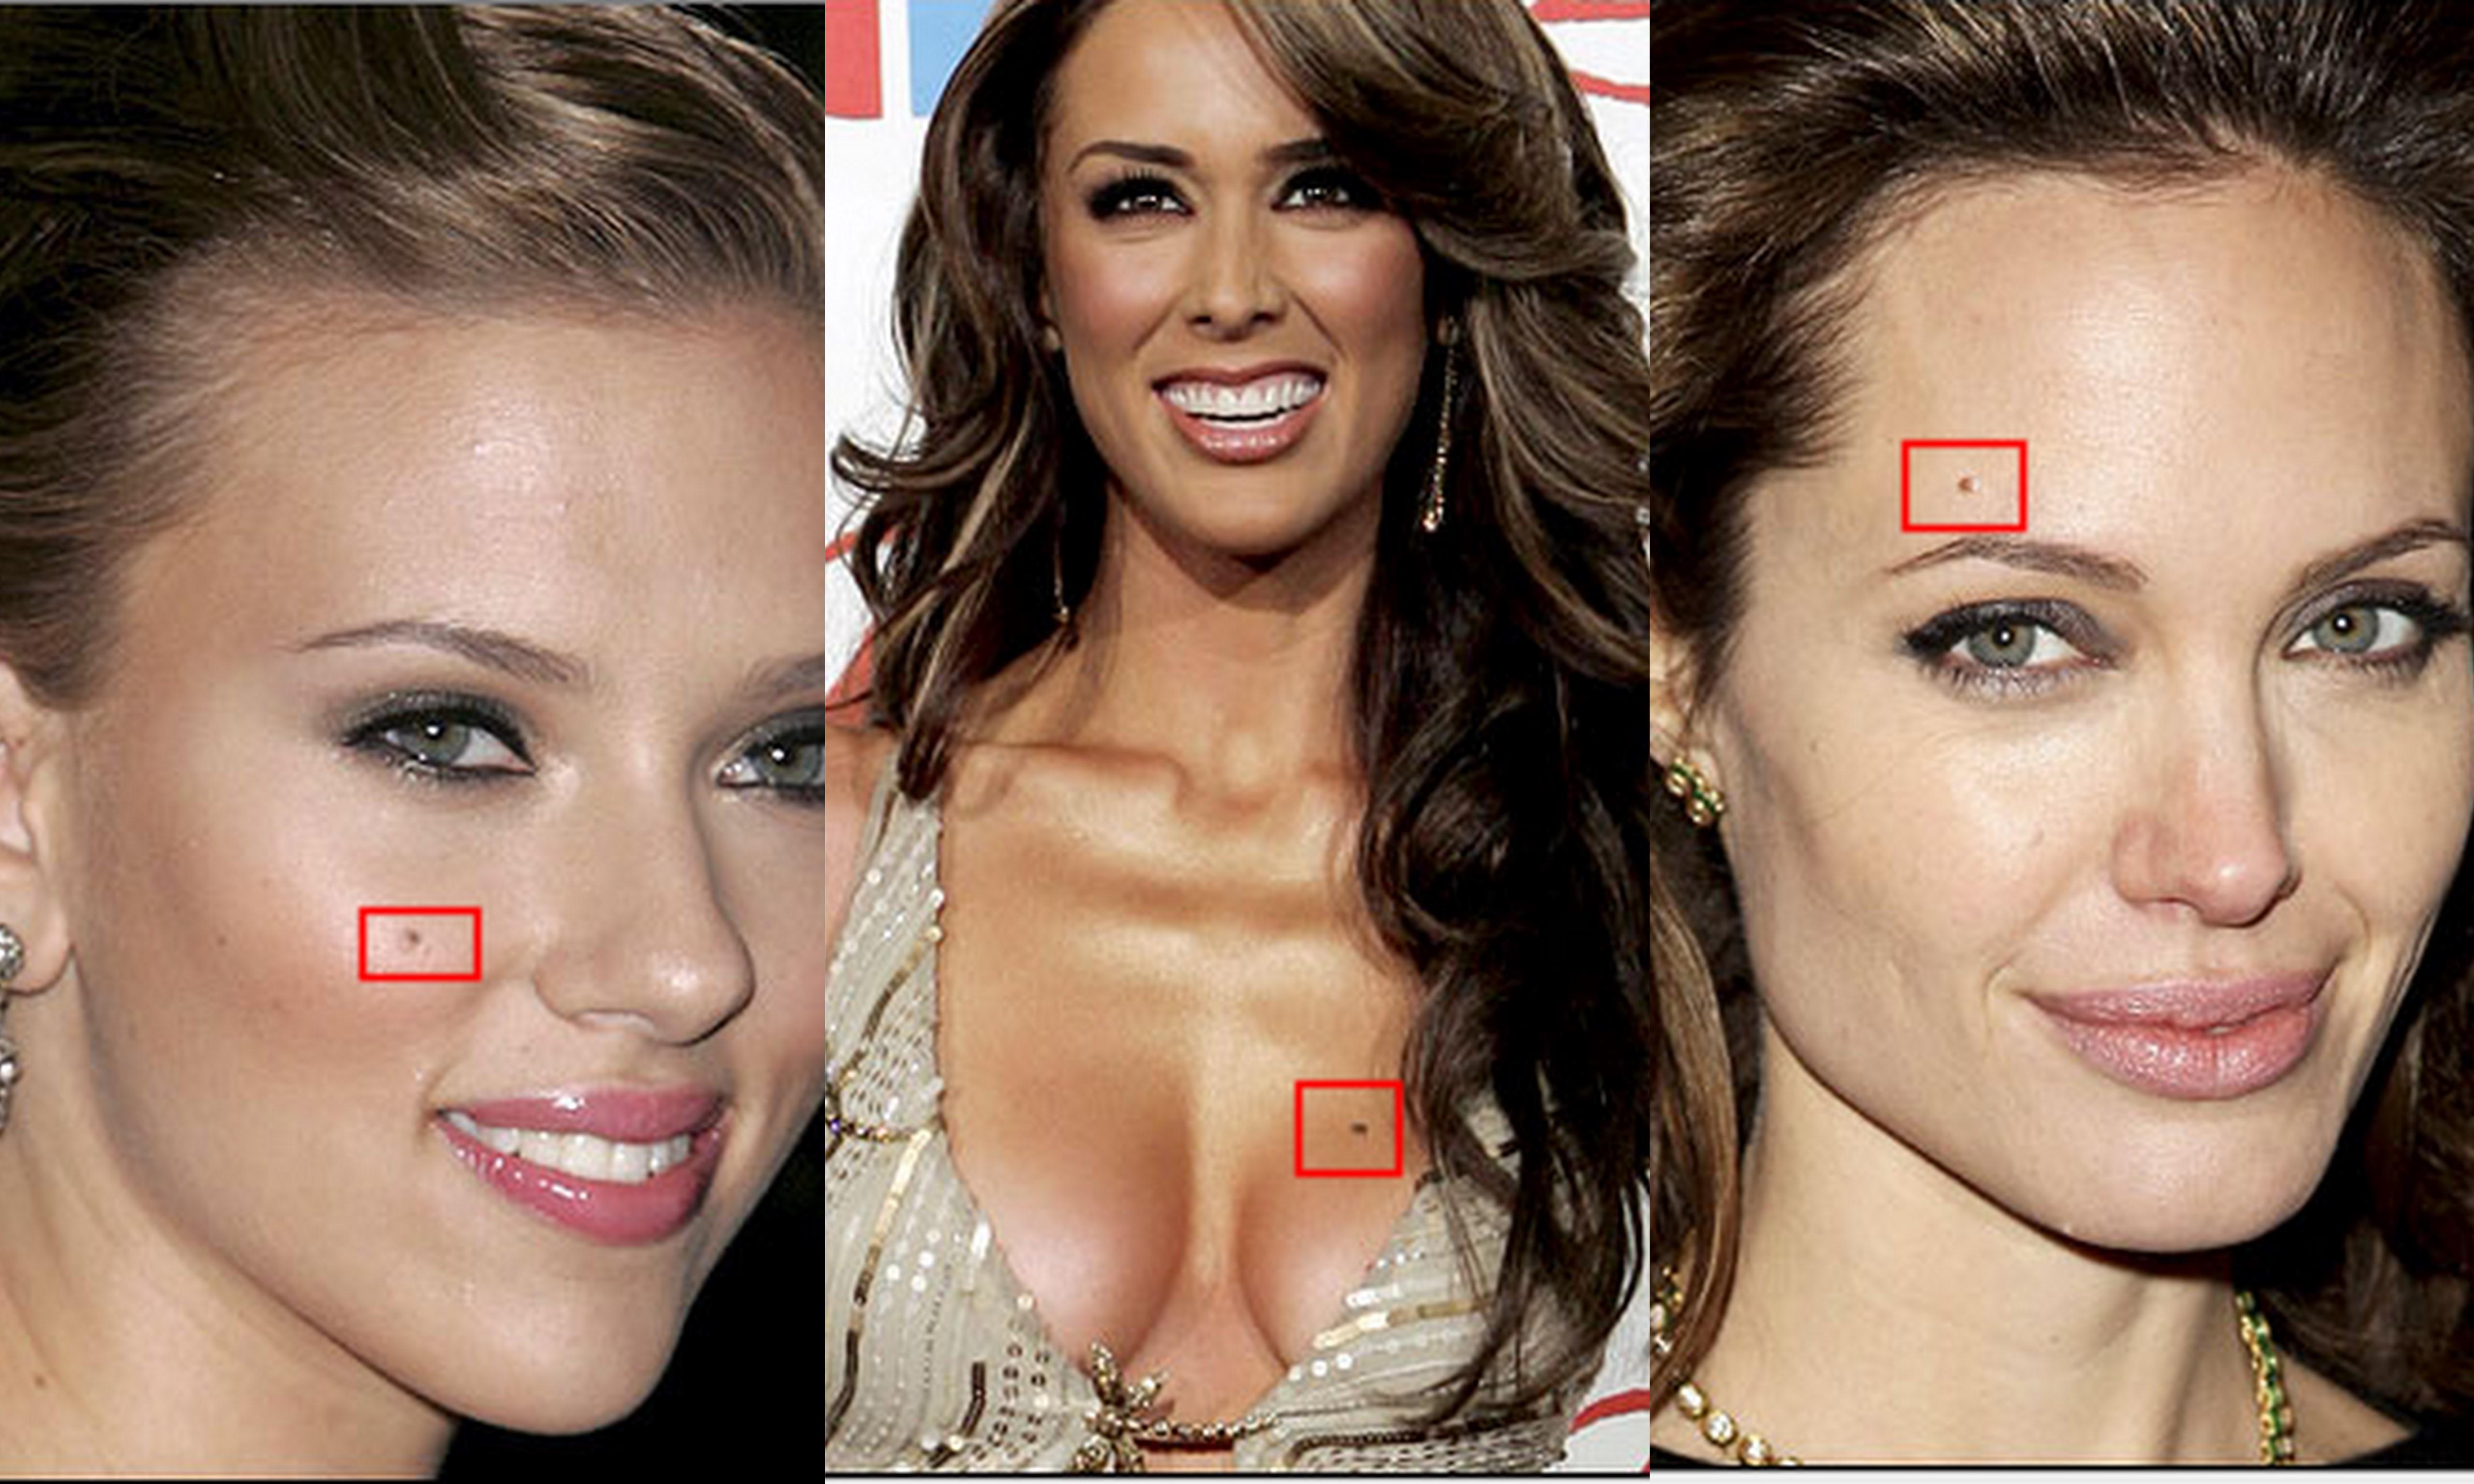 Scarlett Johansson, Jacqueline Bracamontes, Angelina Jolie